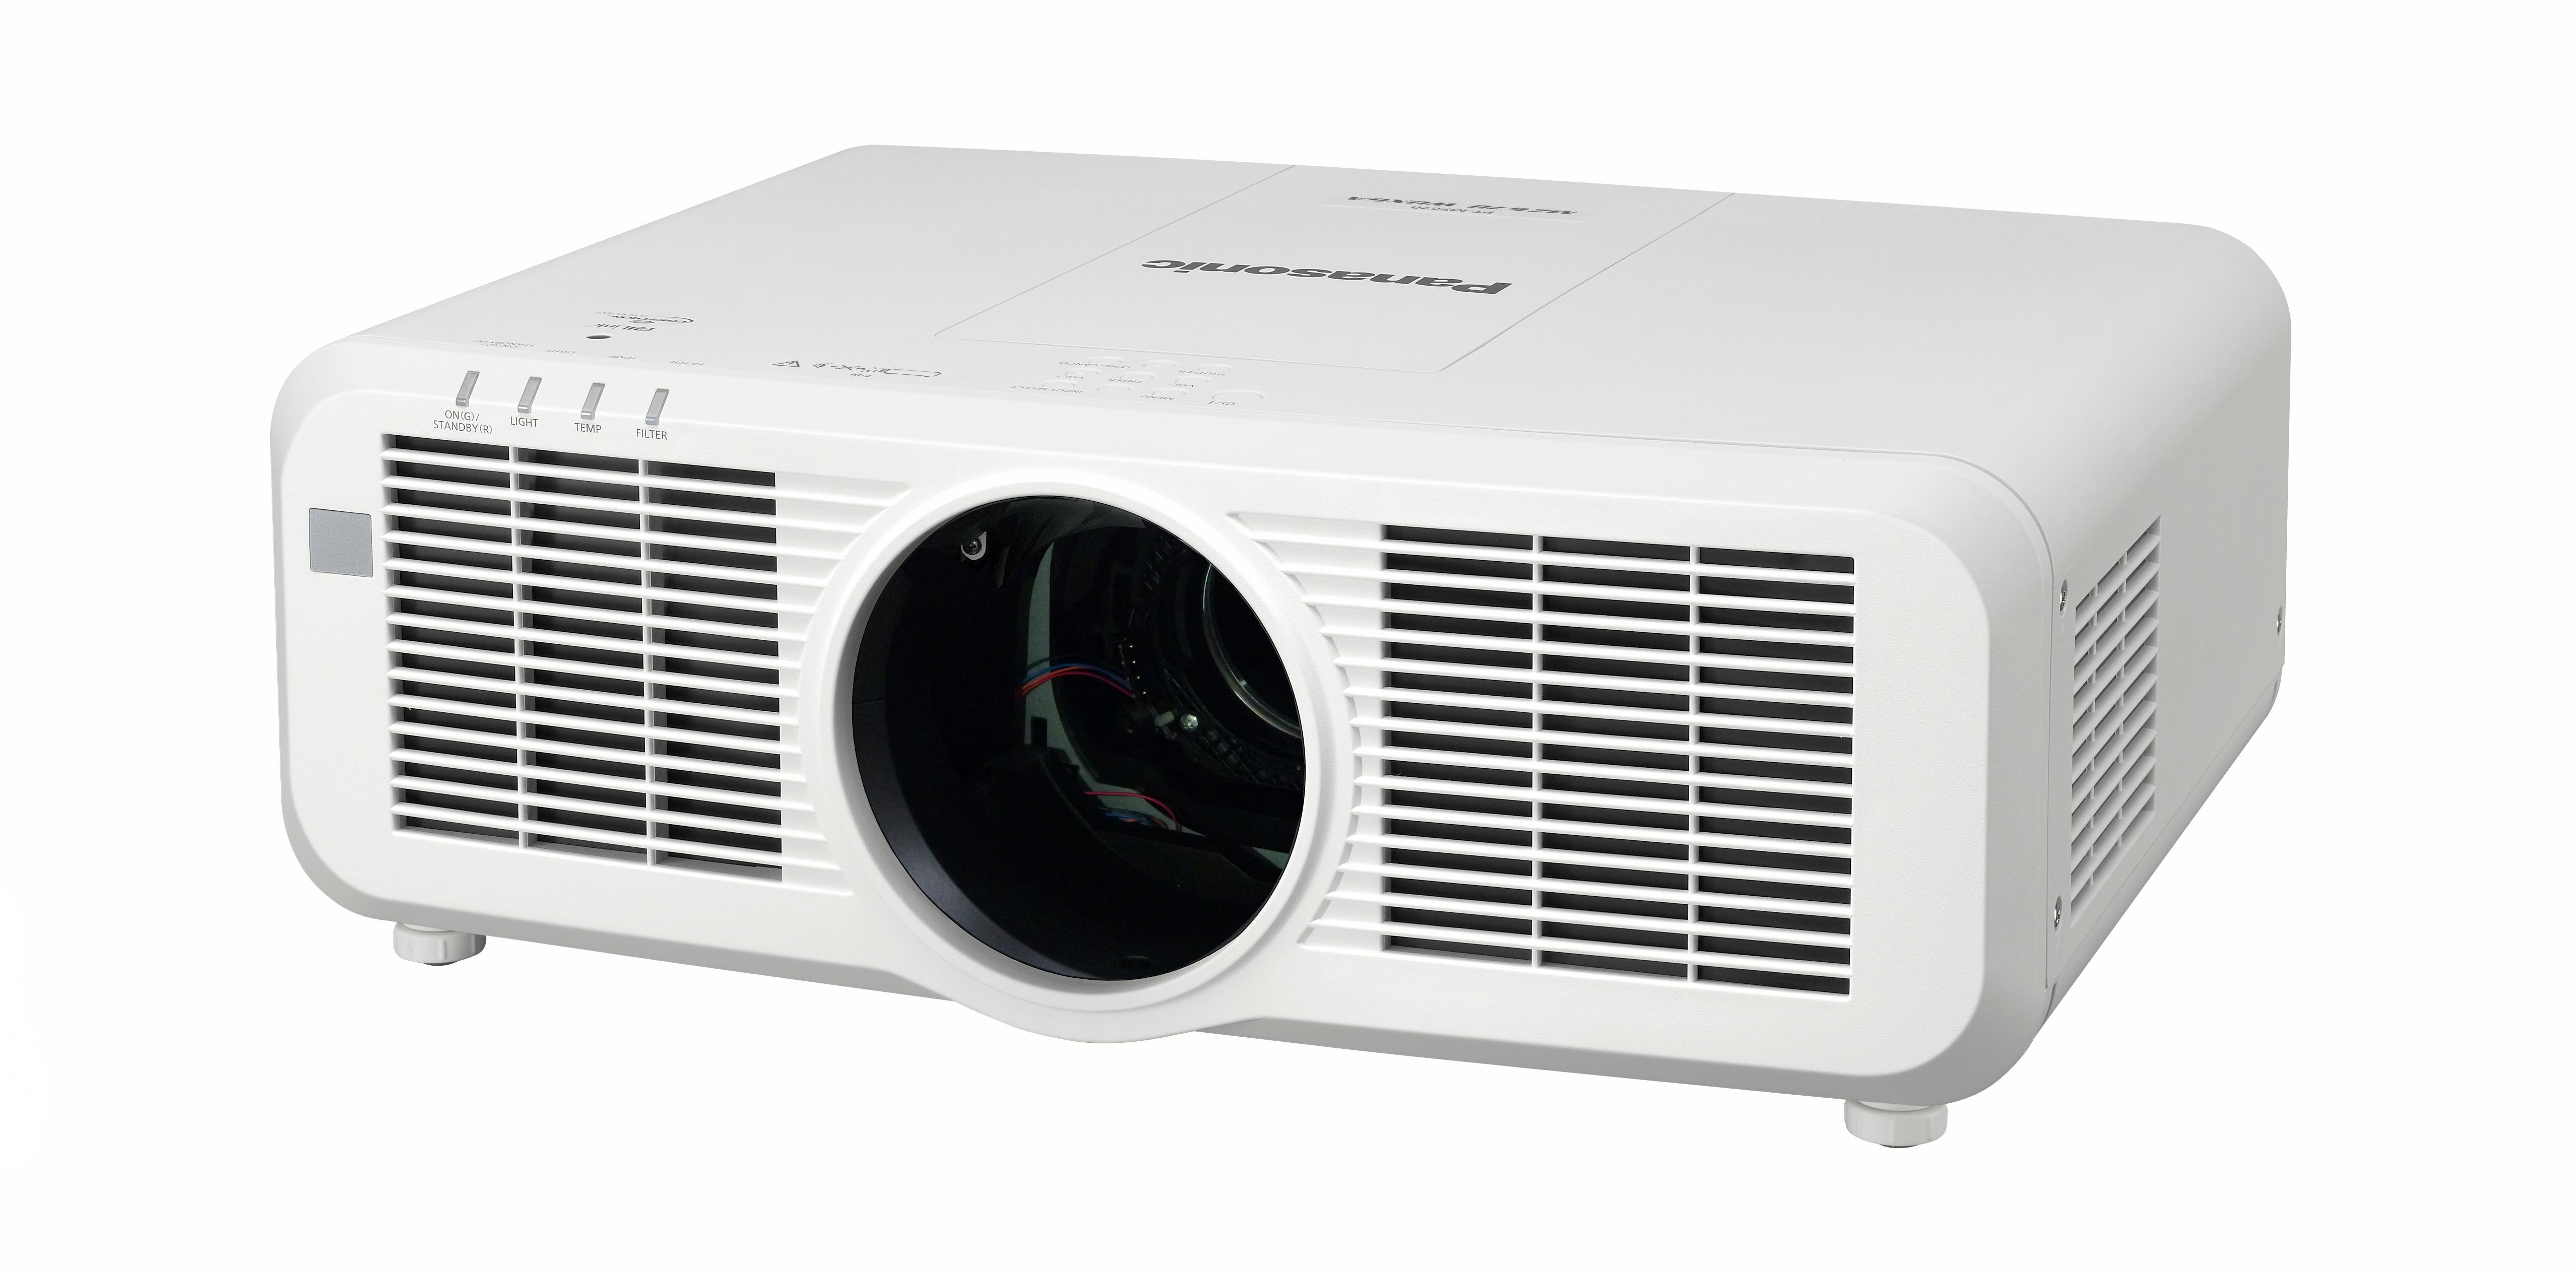 PANASONIC PANASONIC PT-MZ670- Projecteur laser LCD, 6 500 lumens, WUXGA - 1920 x 1200 pixels